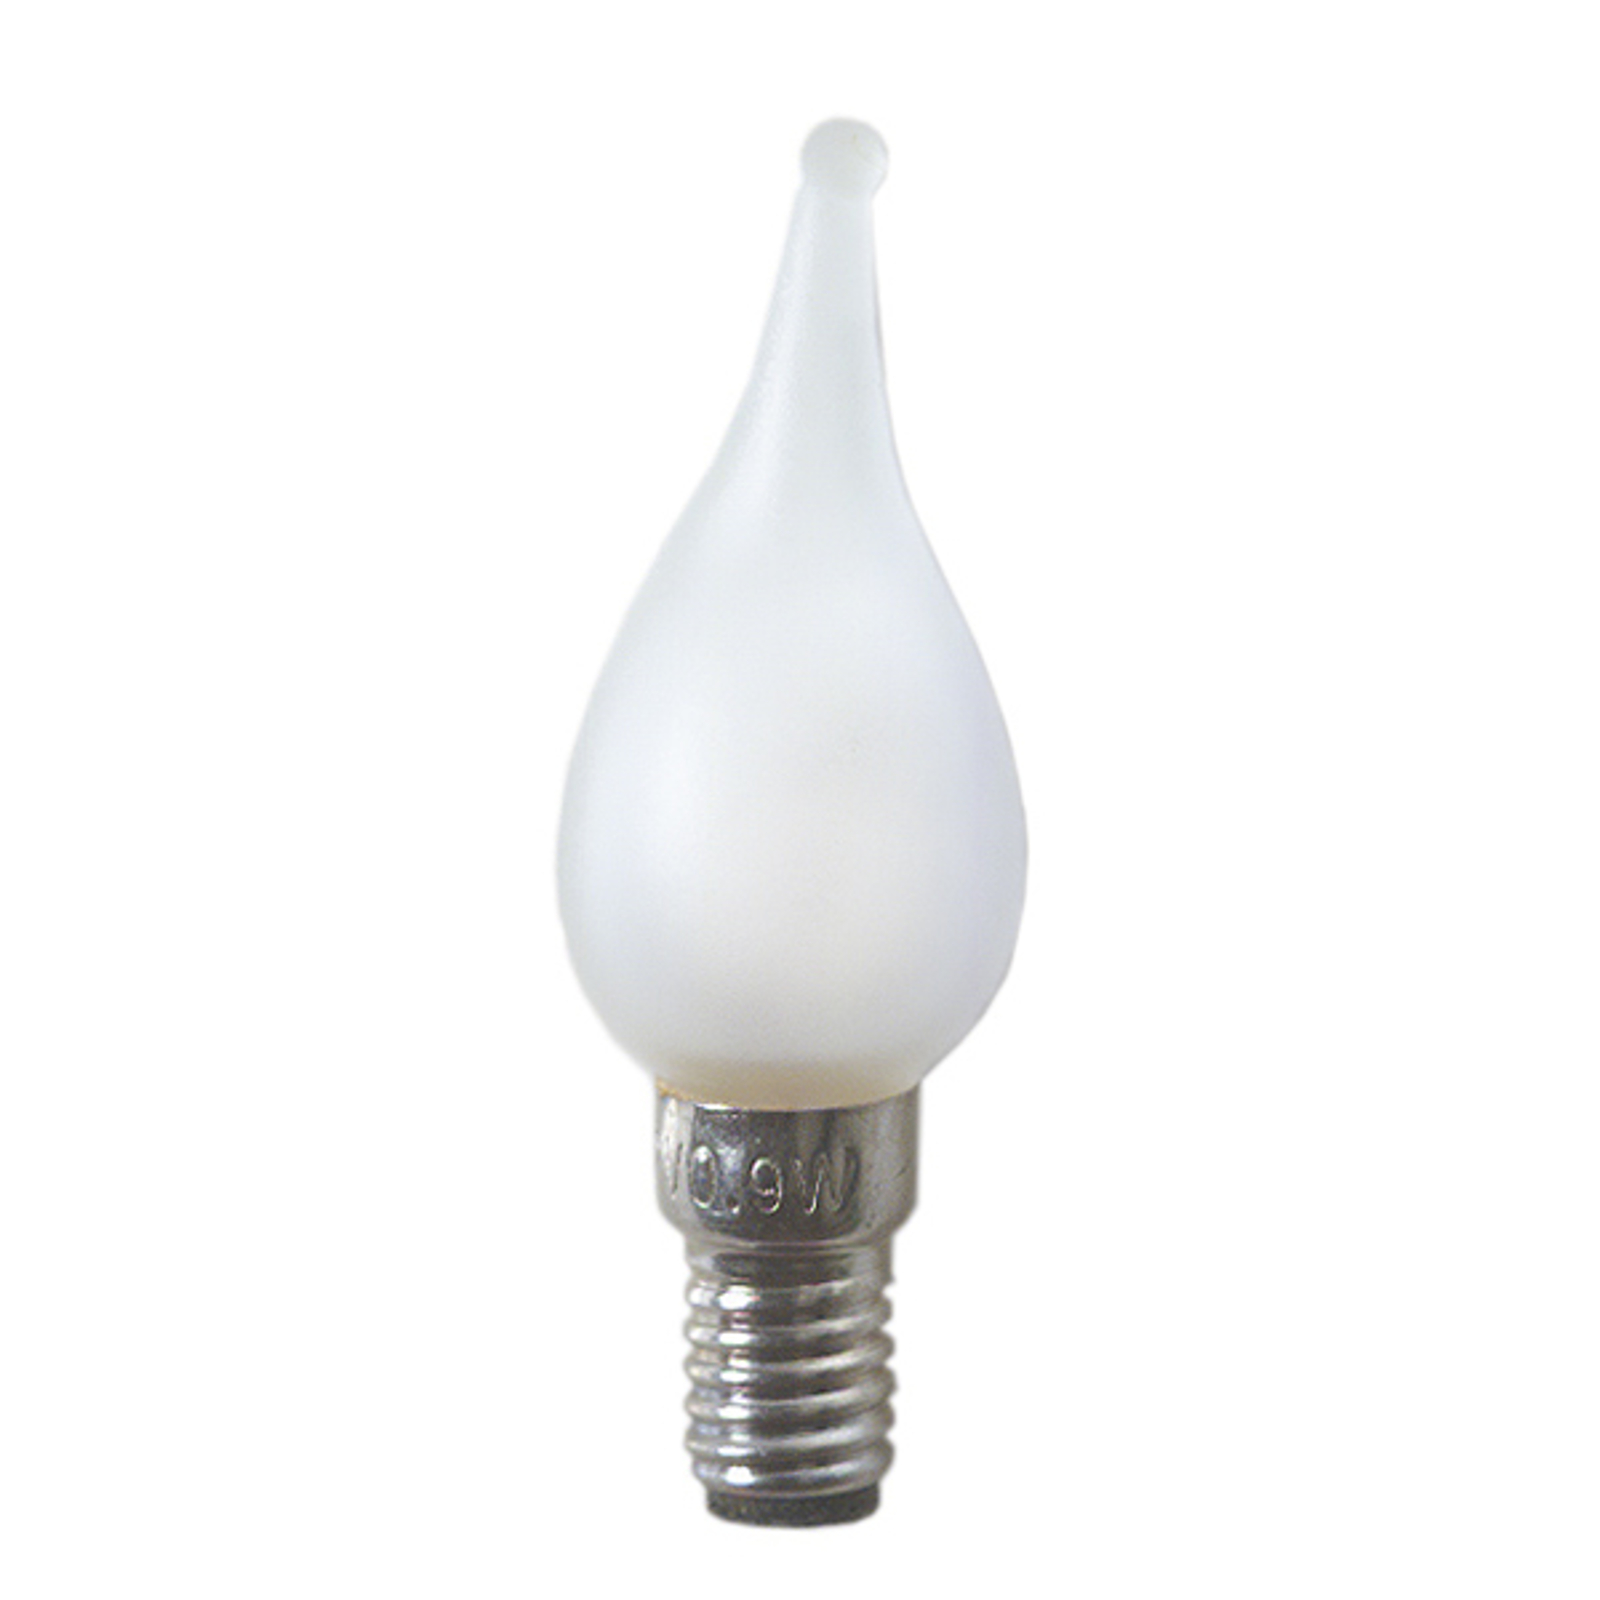 E6 0,9W 12V lampadine ricambio NV set 3x